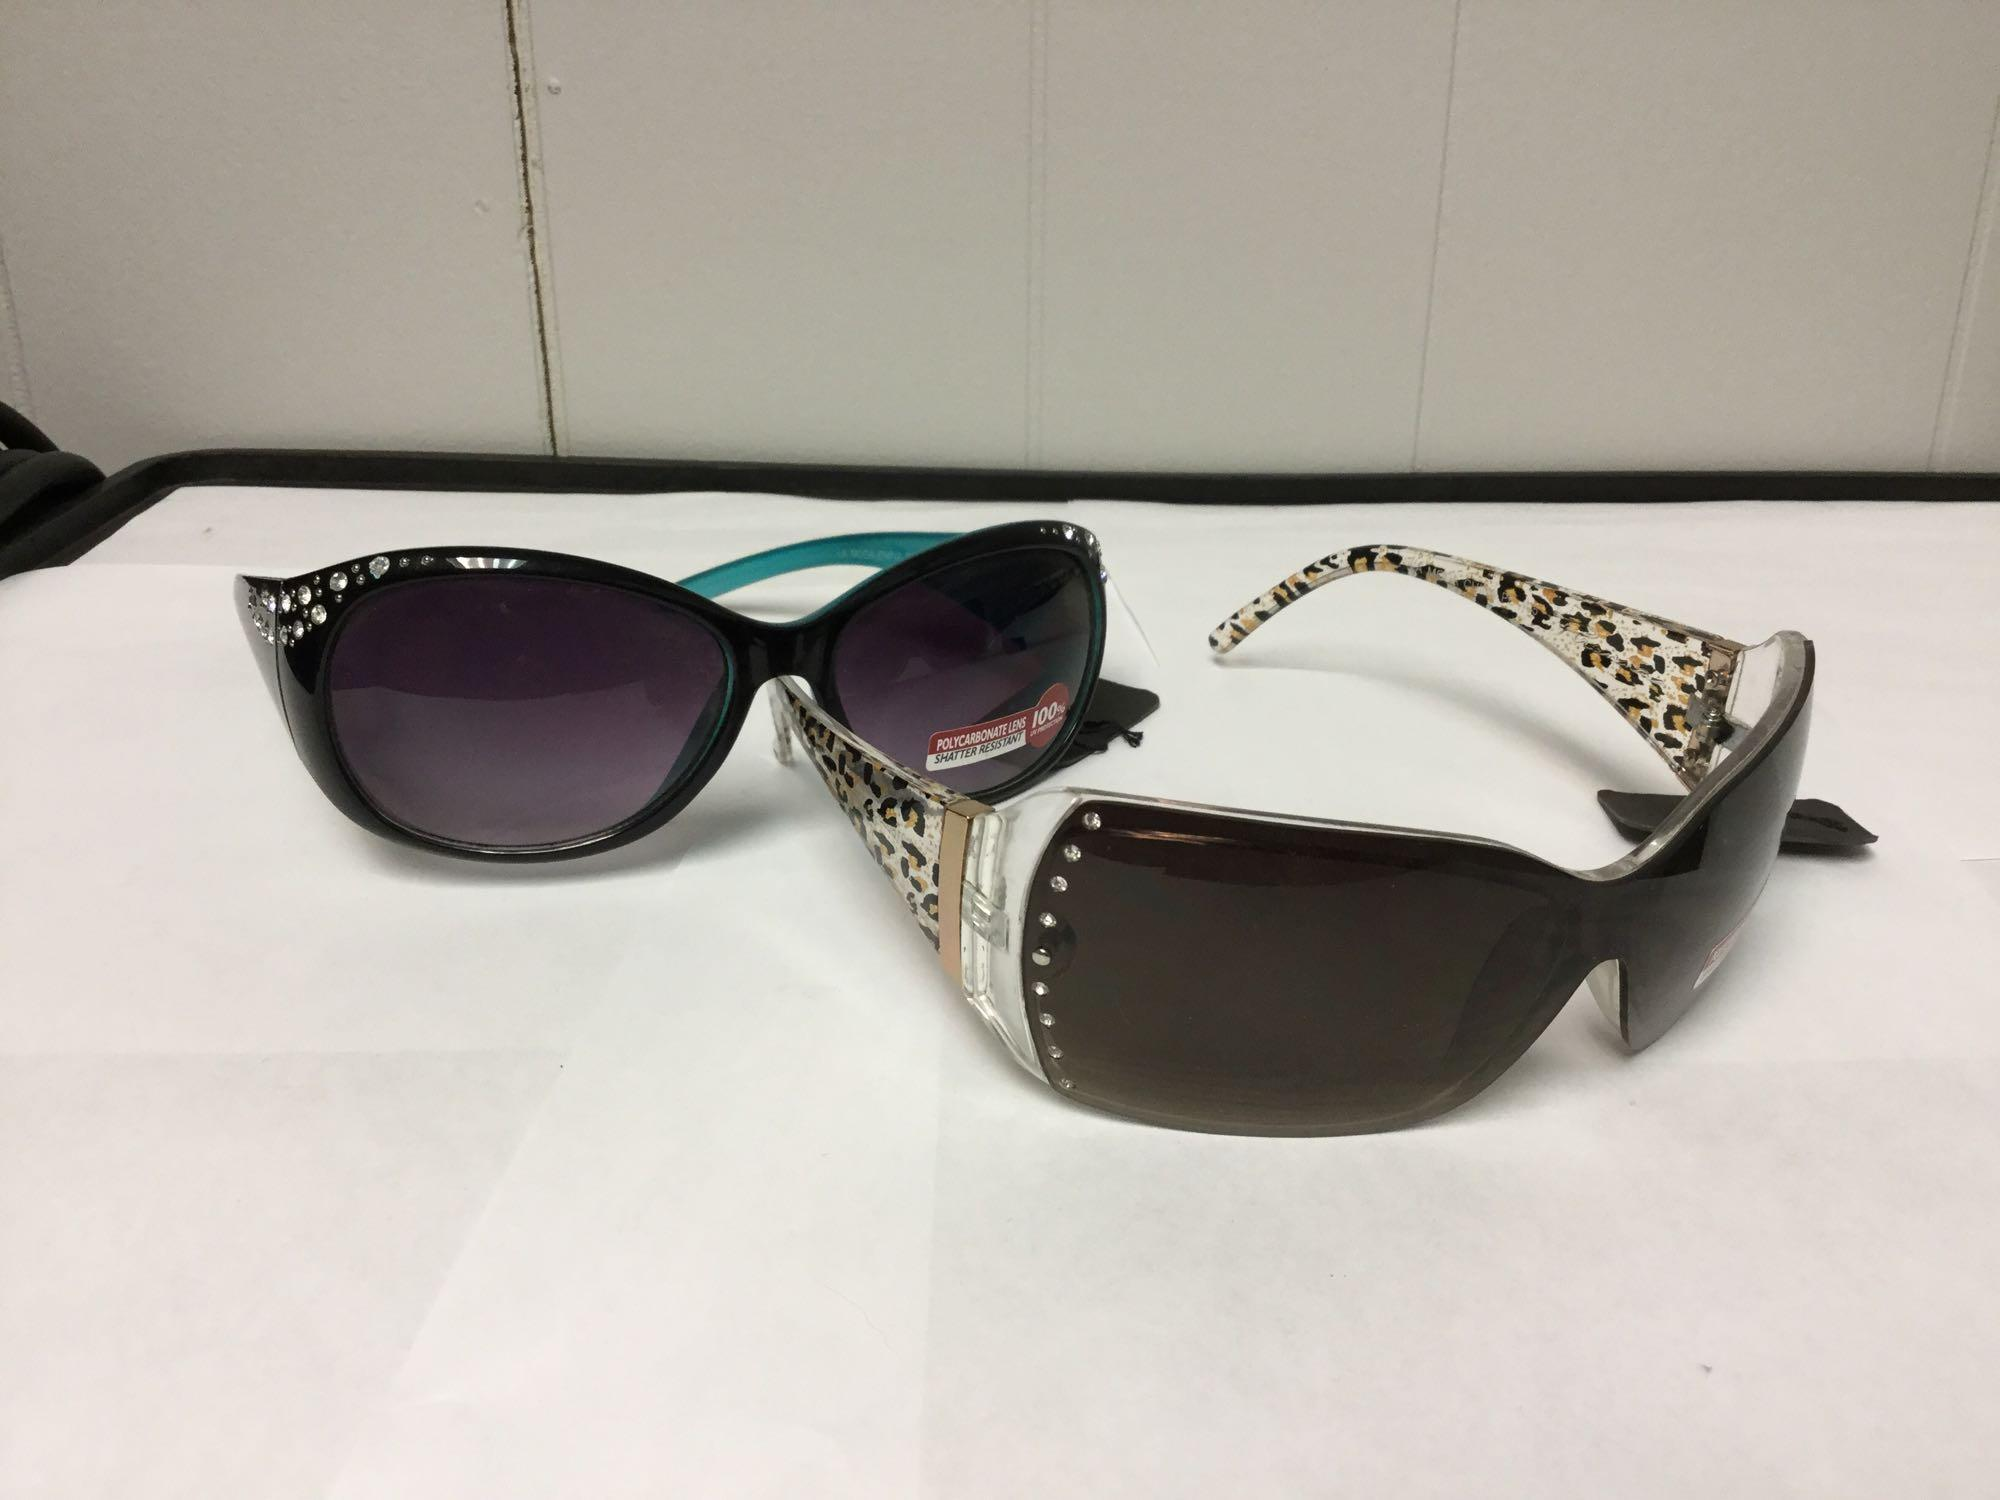 Lot 16 - Lot of 2 Women's Fashion Sunglasses